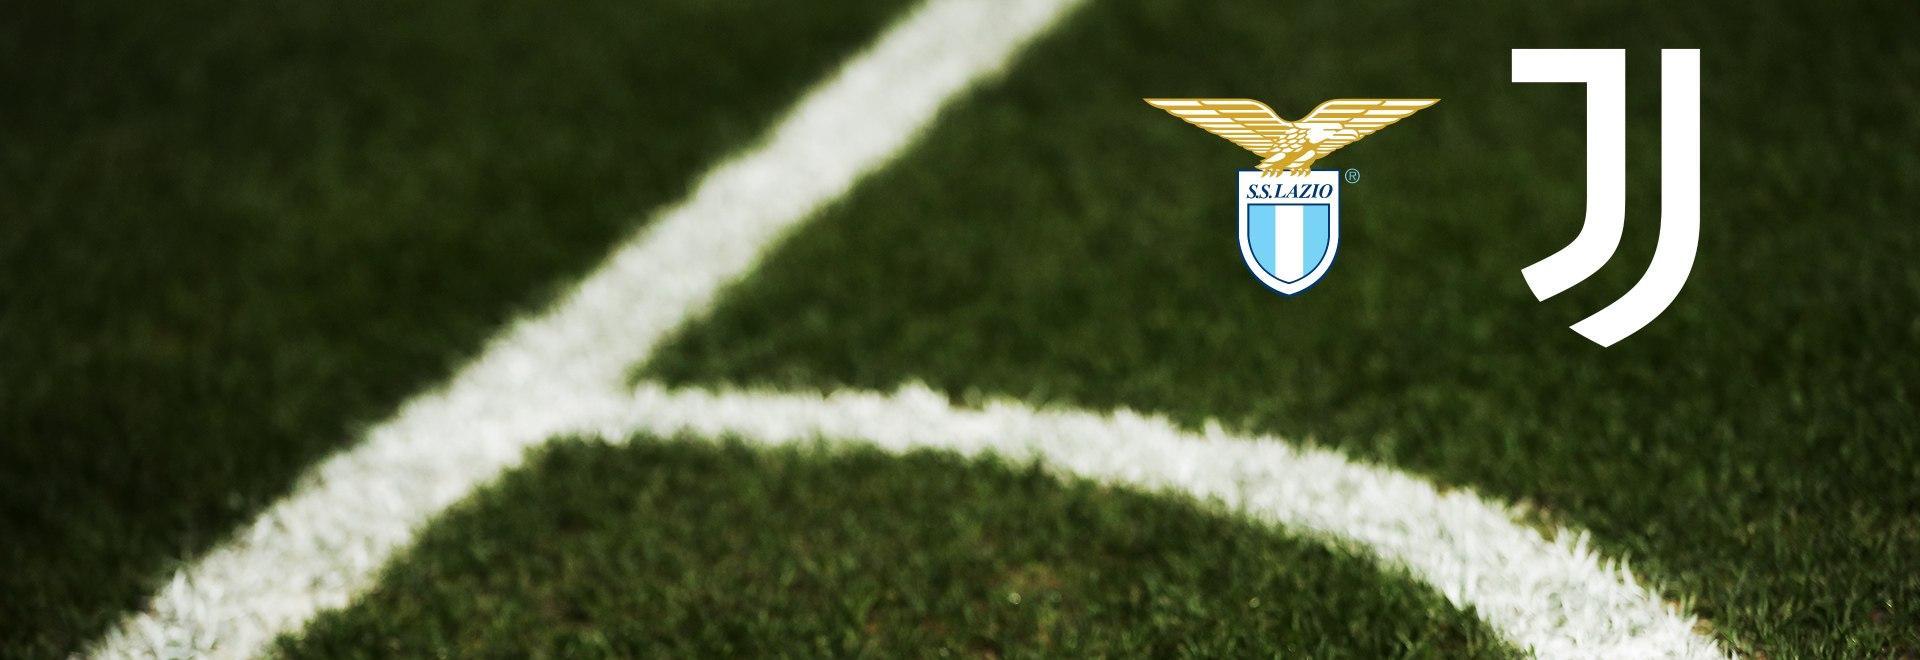 Lazio - Juventus. 7a g.